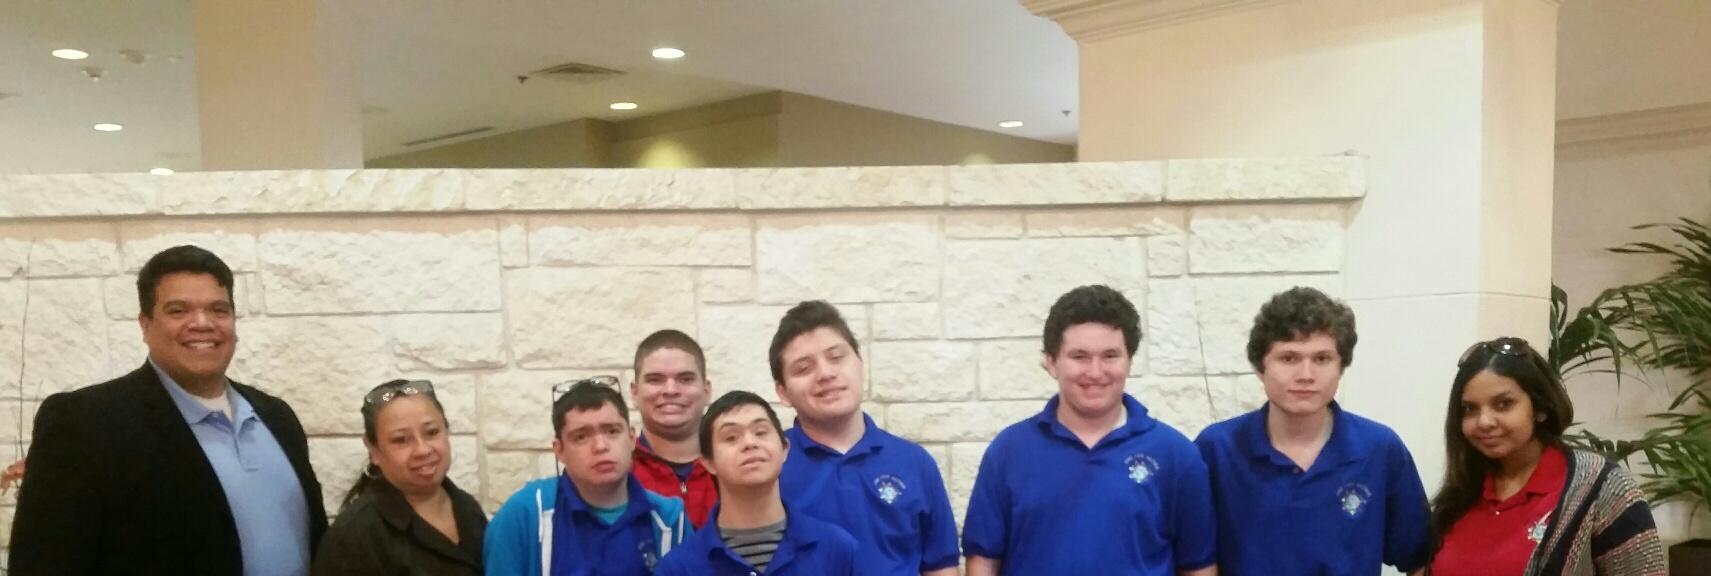 Vocational Program Students 2015